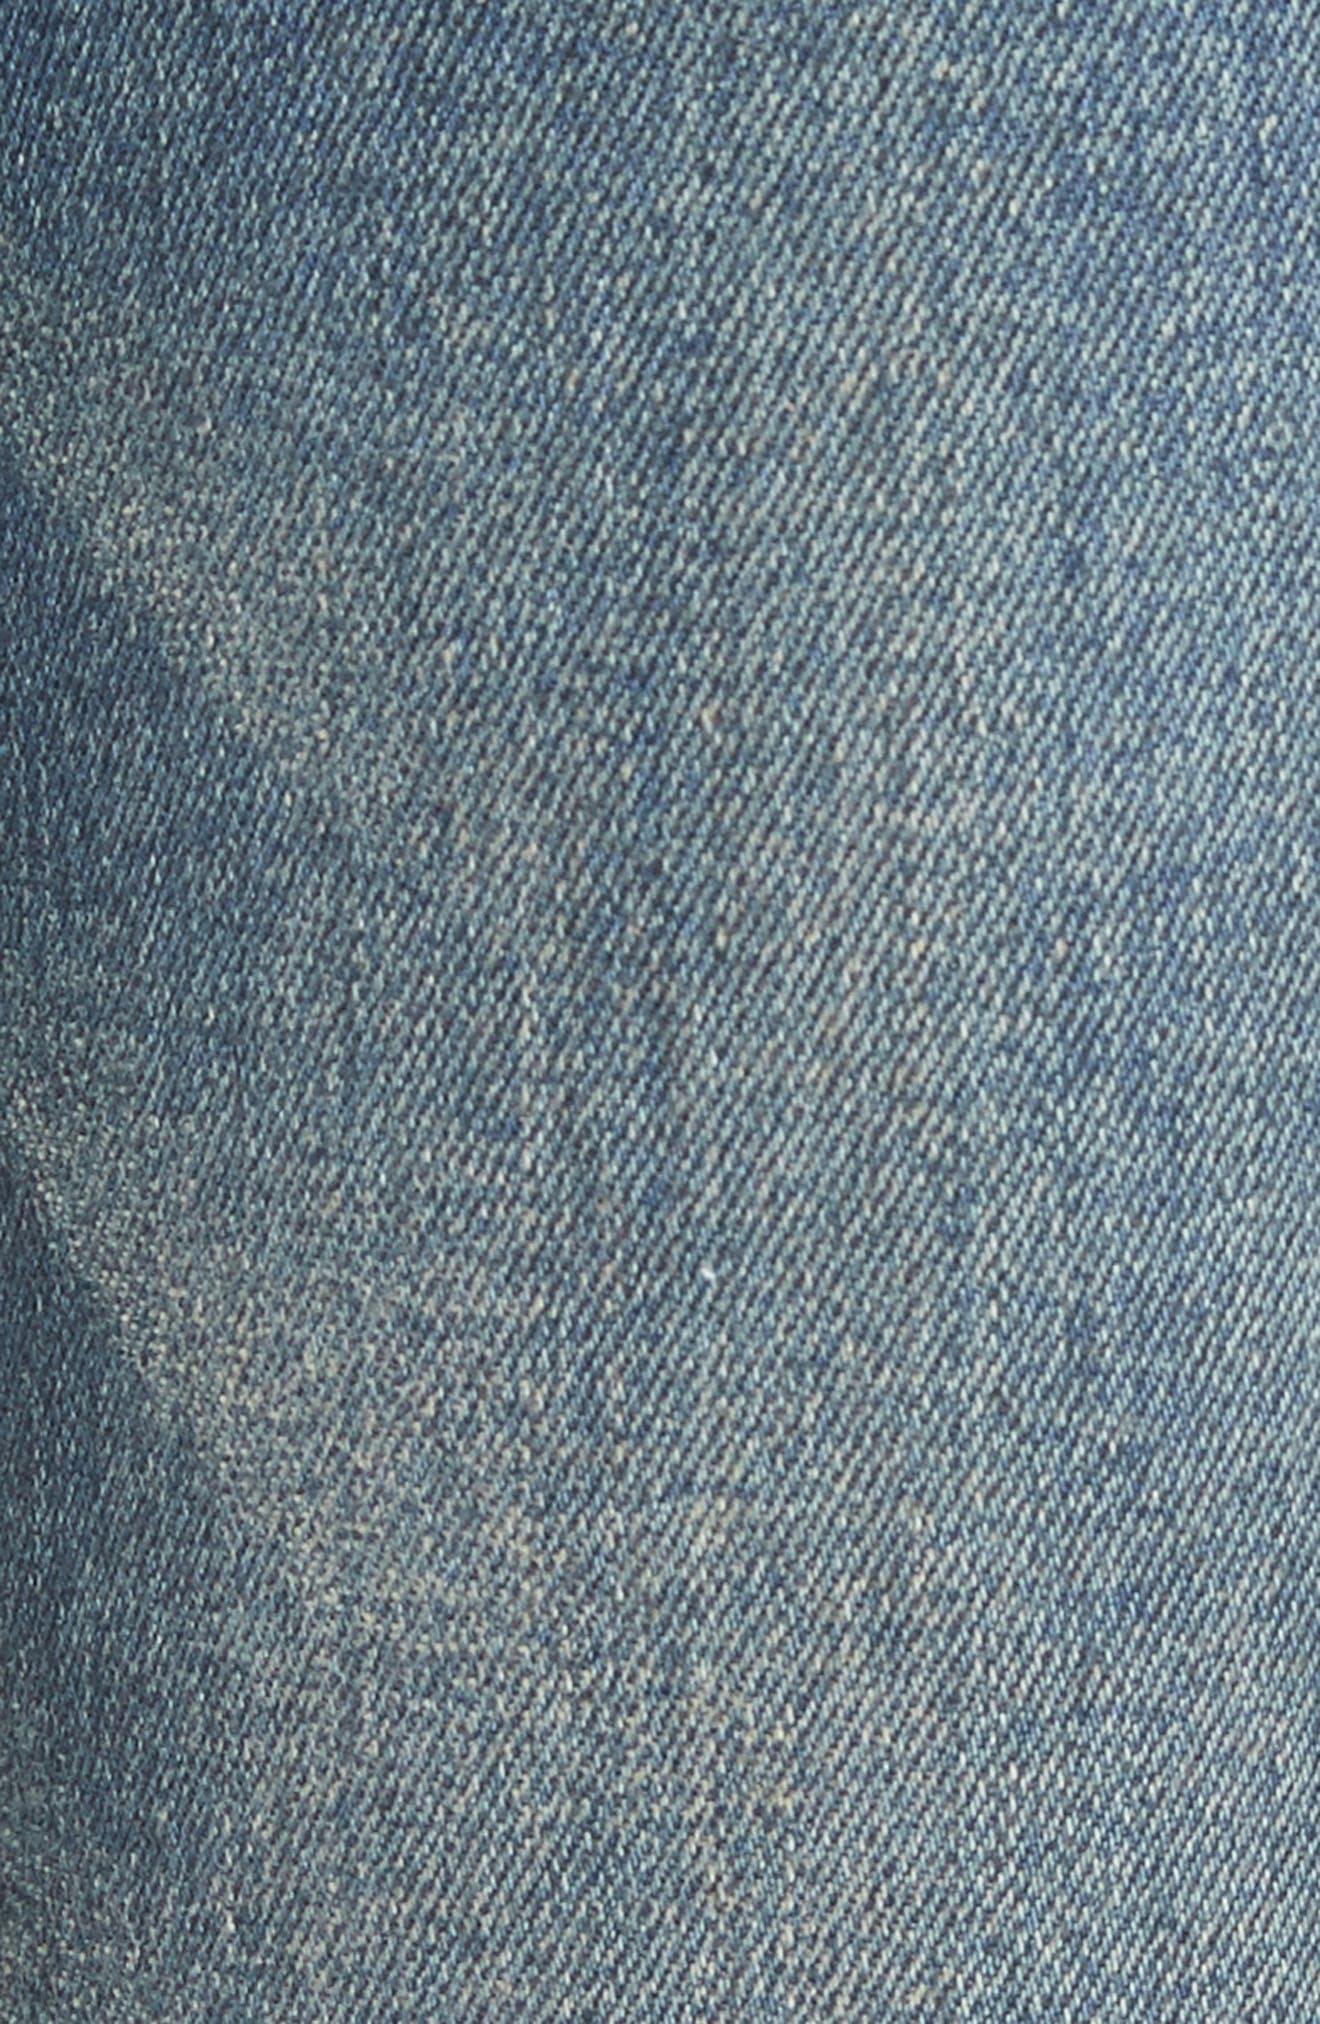 Studded Pocket Skinny Jeans,                             Alternate thumbnail 5, color,                             411